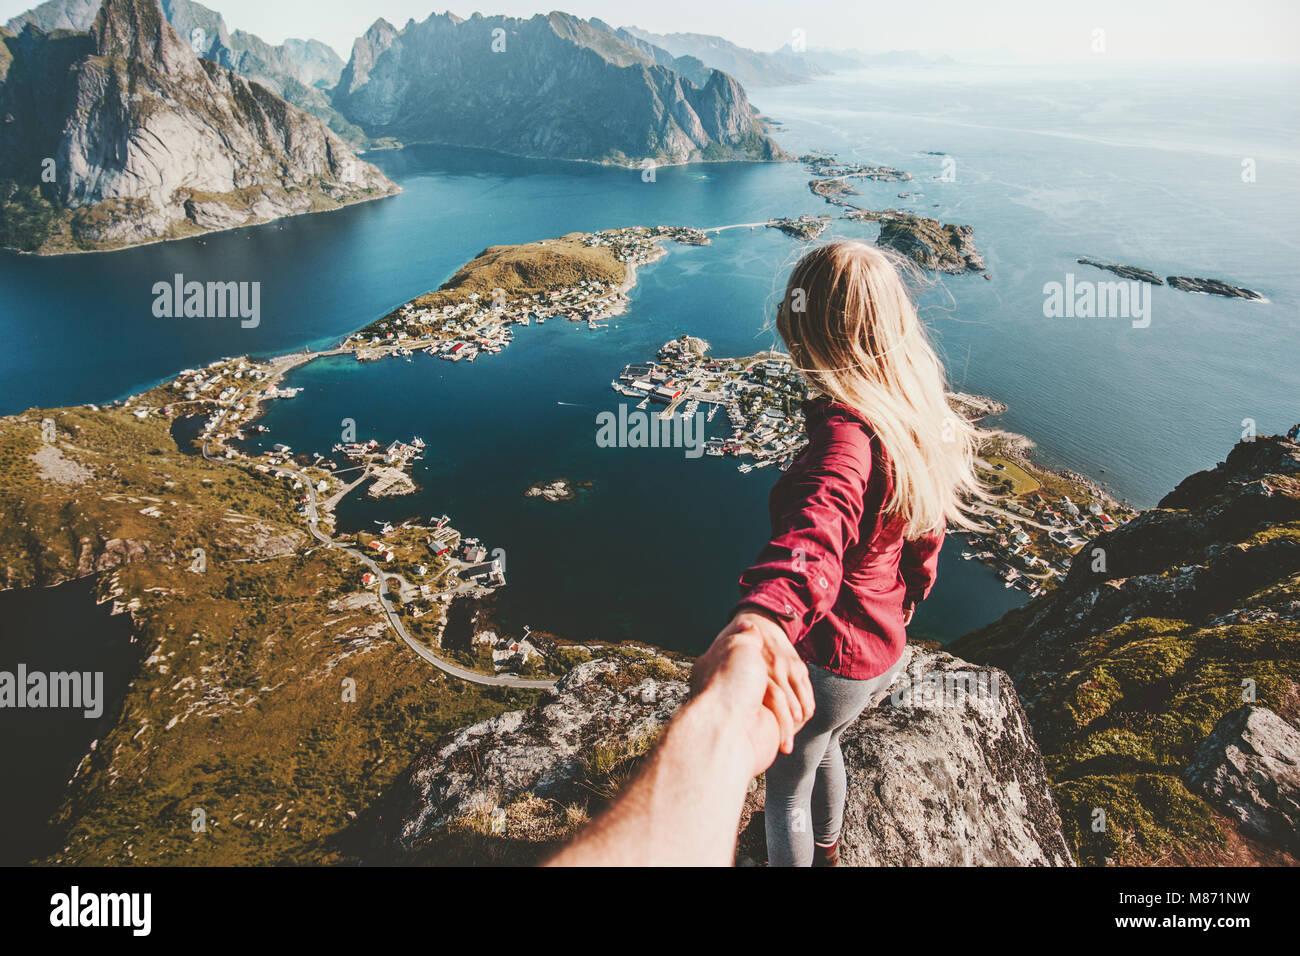 Reisen Ehepaar, Hände auf Felsen Berg in Norwegen Lifestyle-konzept Sommerferien outdoor Lofoten Reinebringen Stockbild